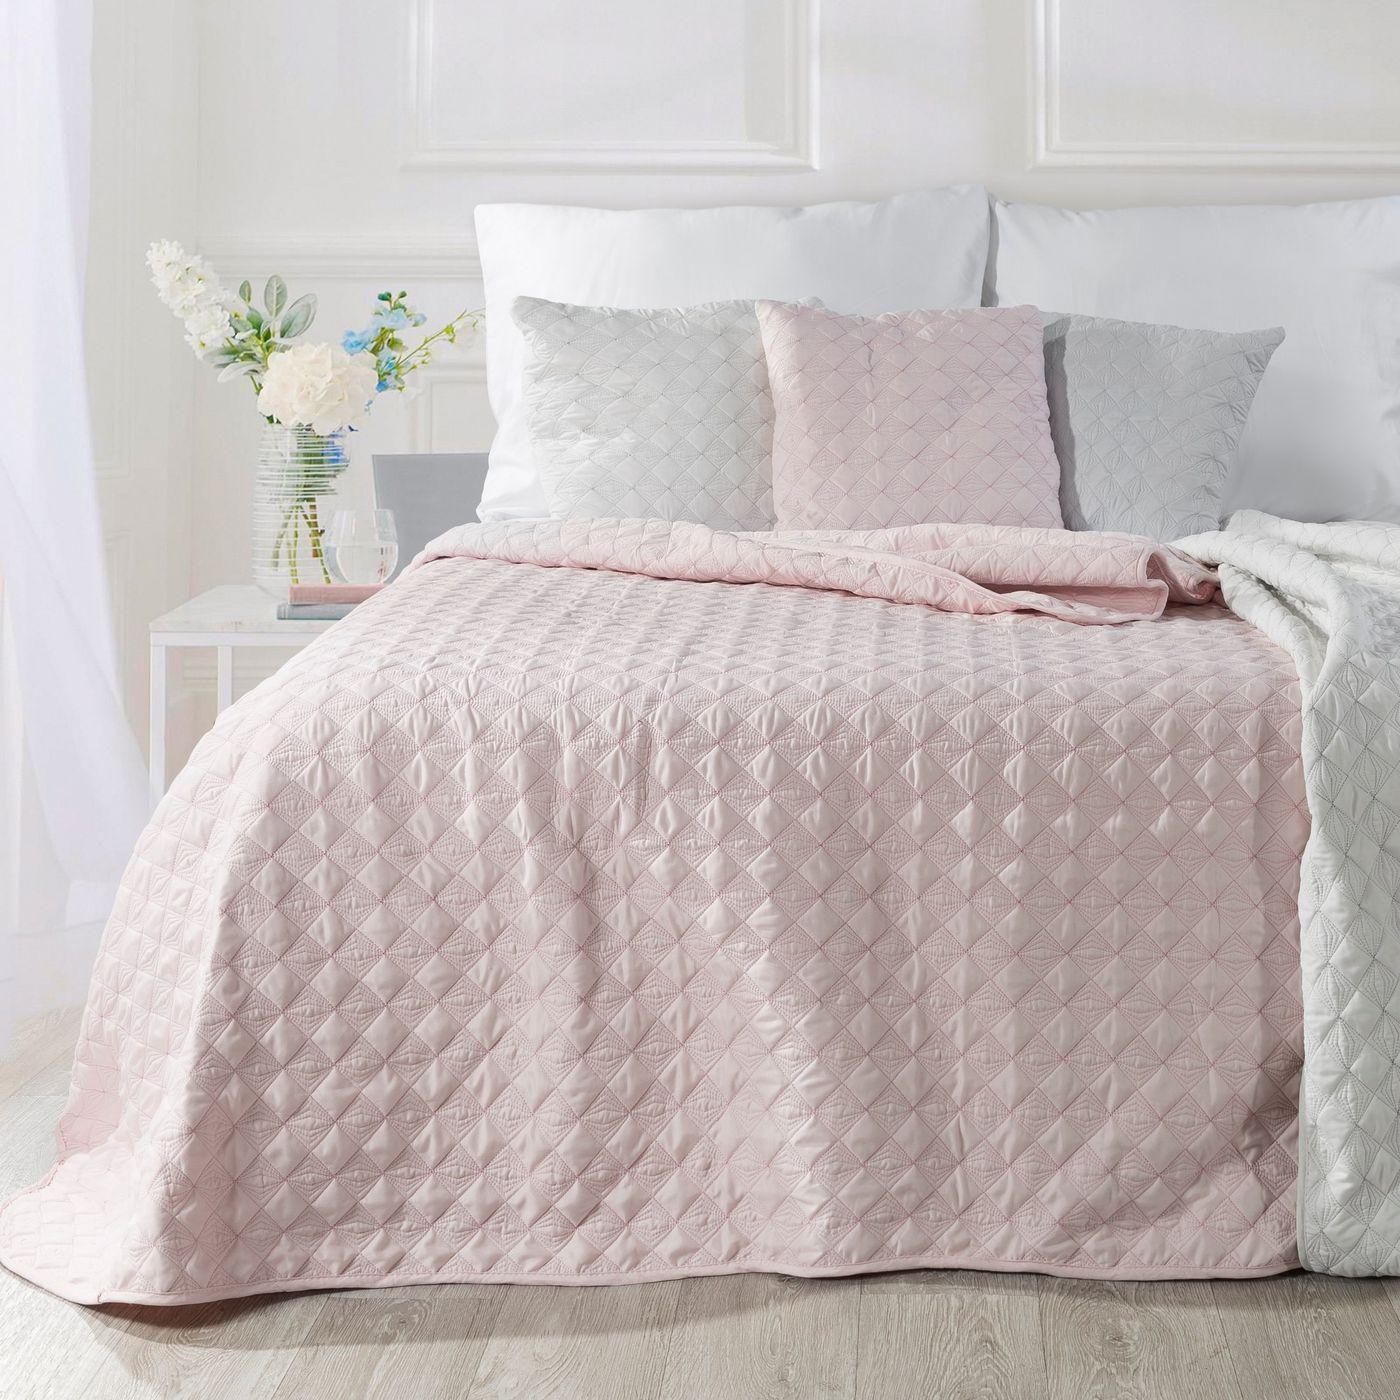 Narzuta na łóżko pikowana srebrna nić 170x210 cm różowa